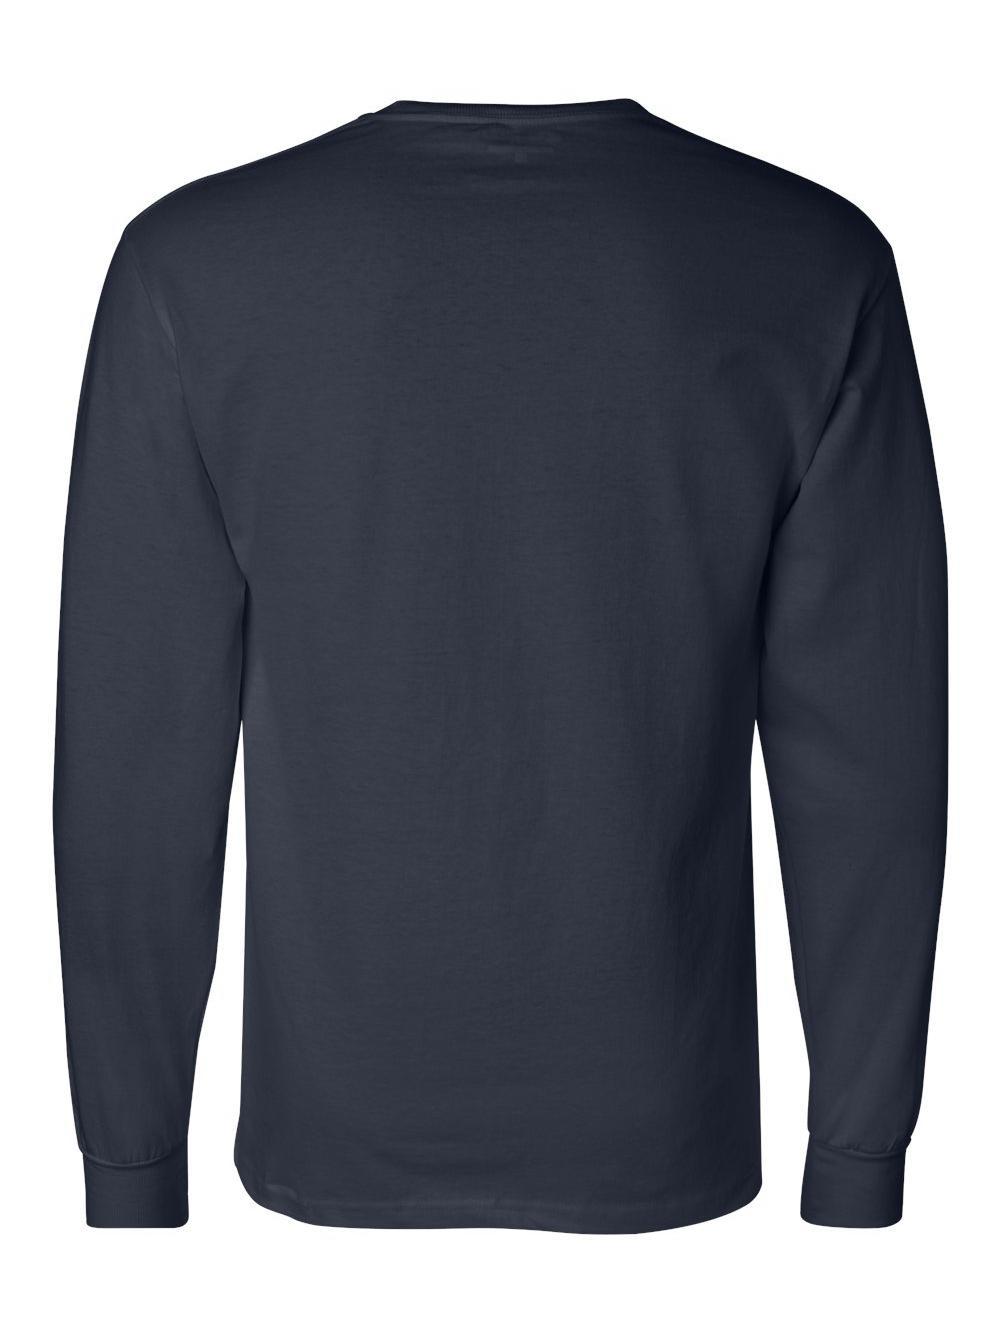 Champion-Long-Sleeve-T-Shirt-CC8C thumbnail 10